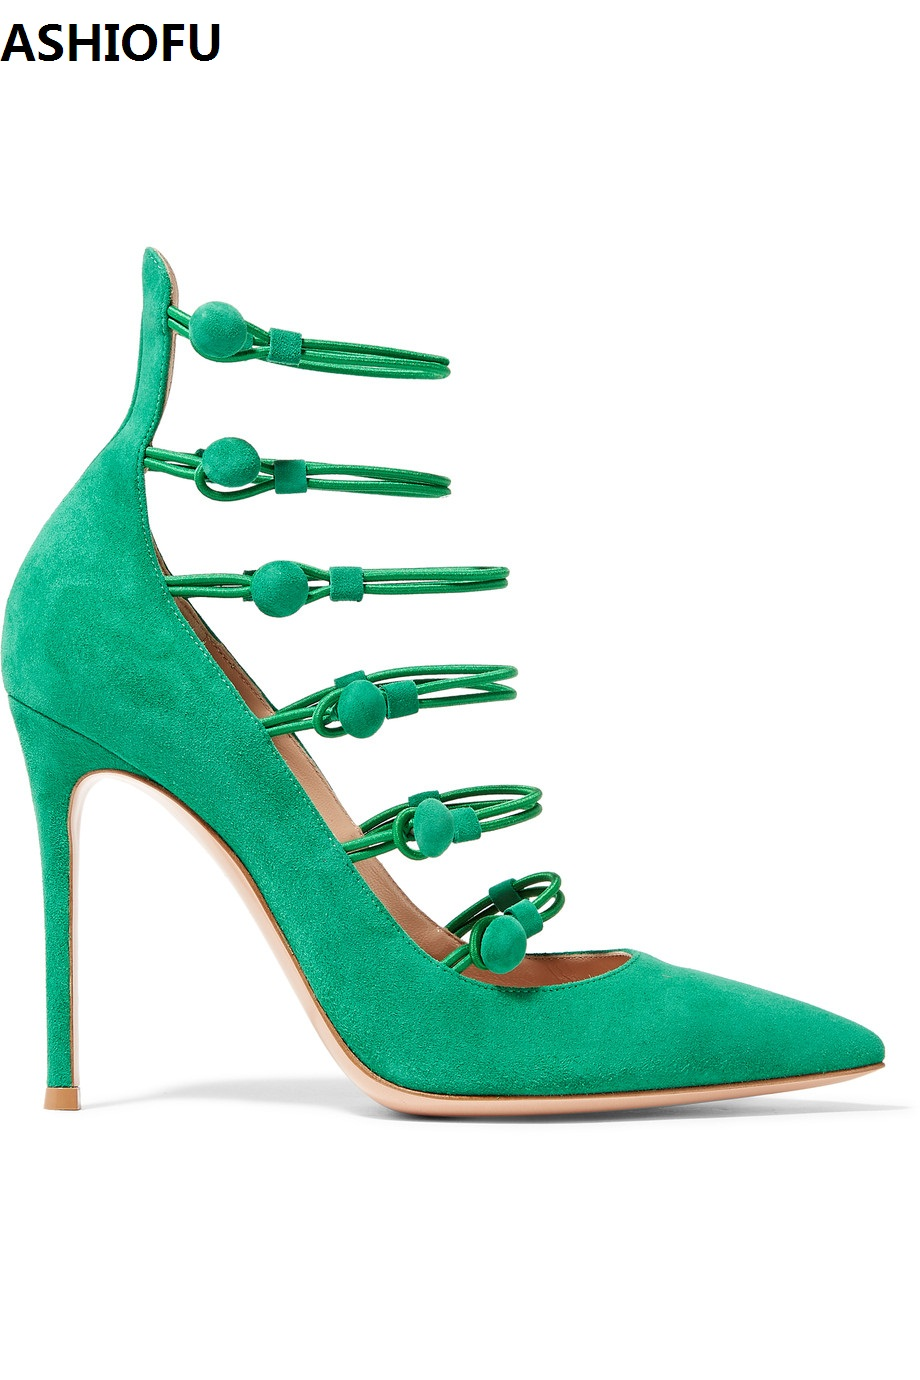 ASHIOFU Handmade New Ladies High Heel Pumps Buckle Straps Sexy Party Prom Dress Shoes Fashion Evening Club Court Shoes